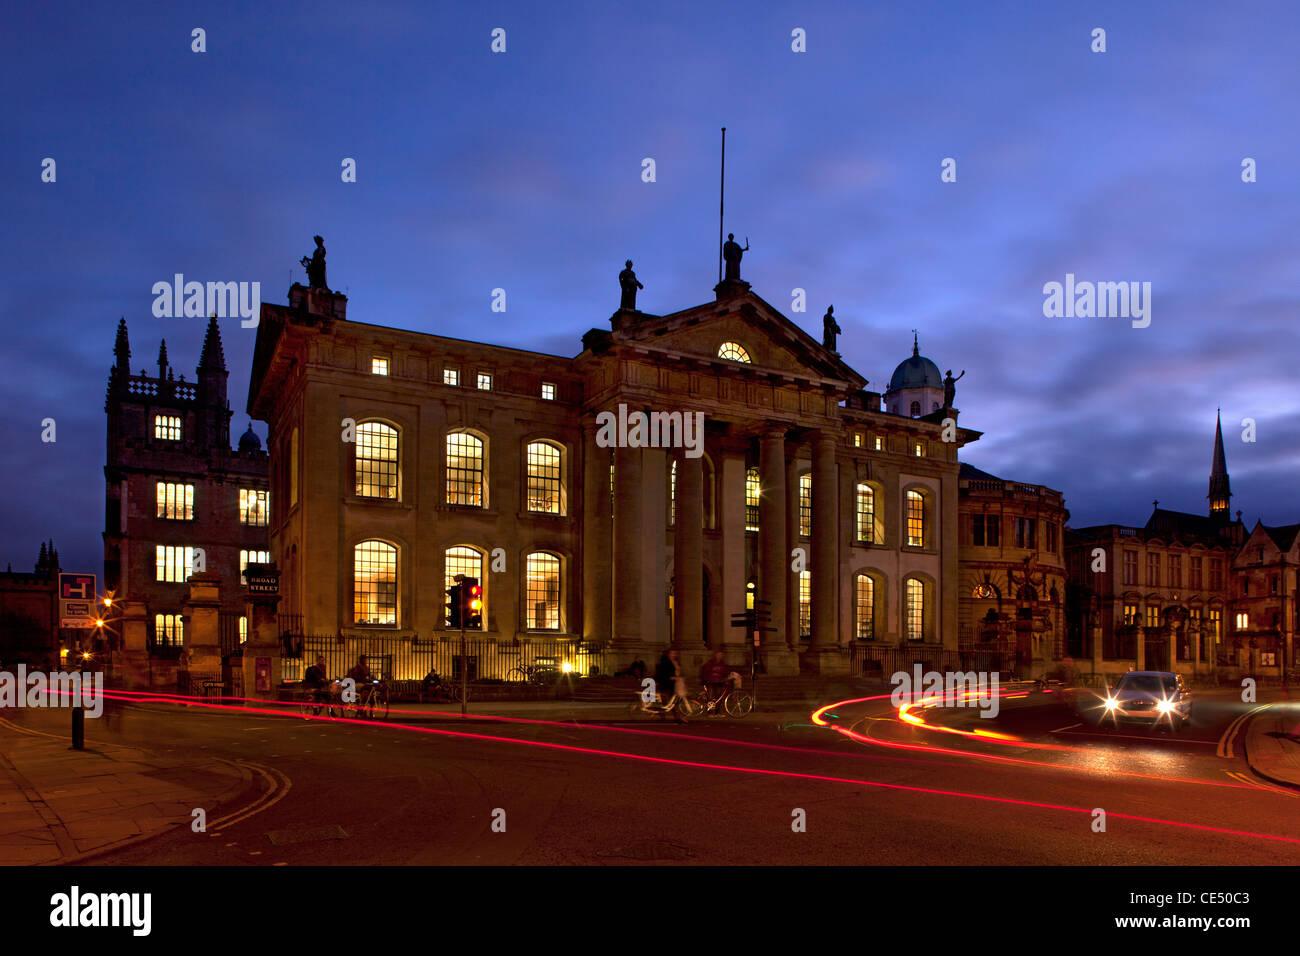 Clarendon Gebäude bei Nacht, Broad Street, Oxford, Oxforshire, england Stockbild